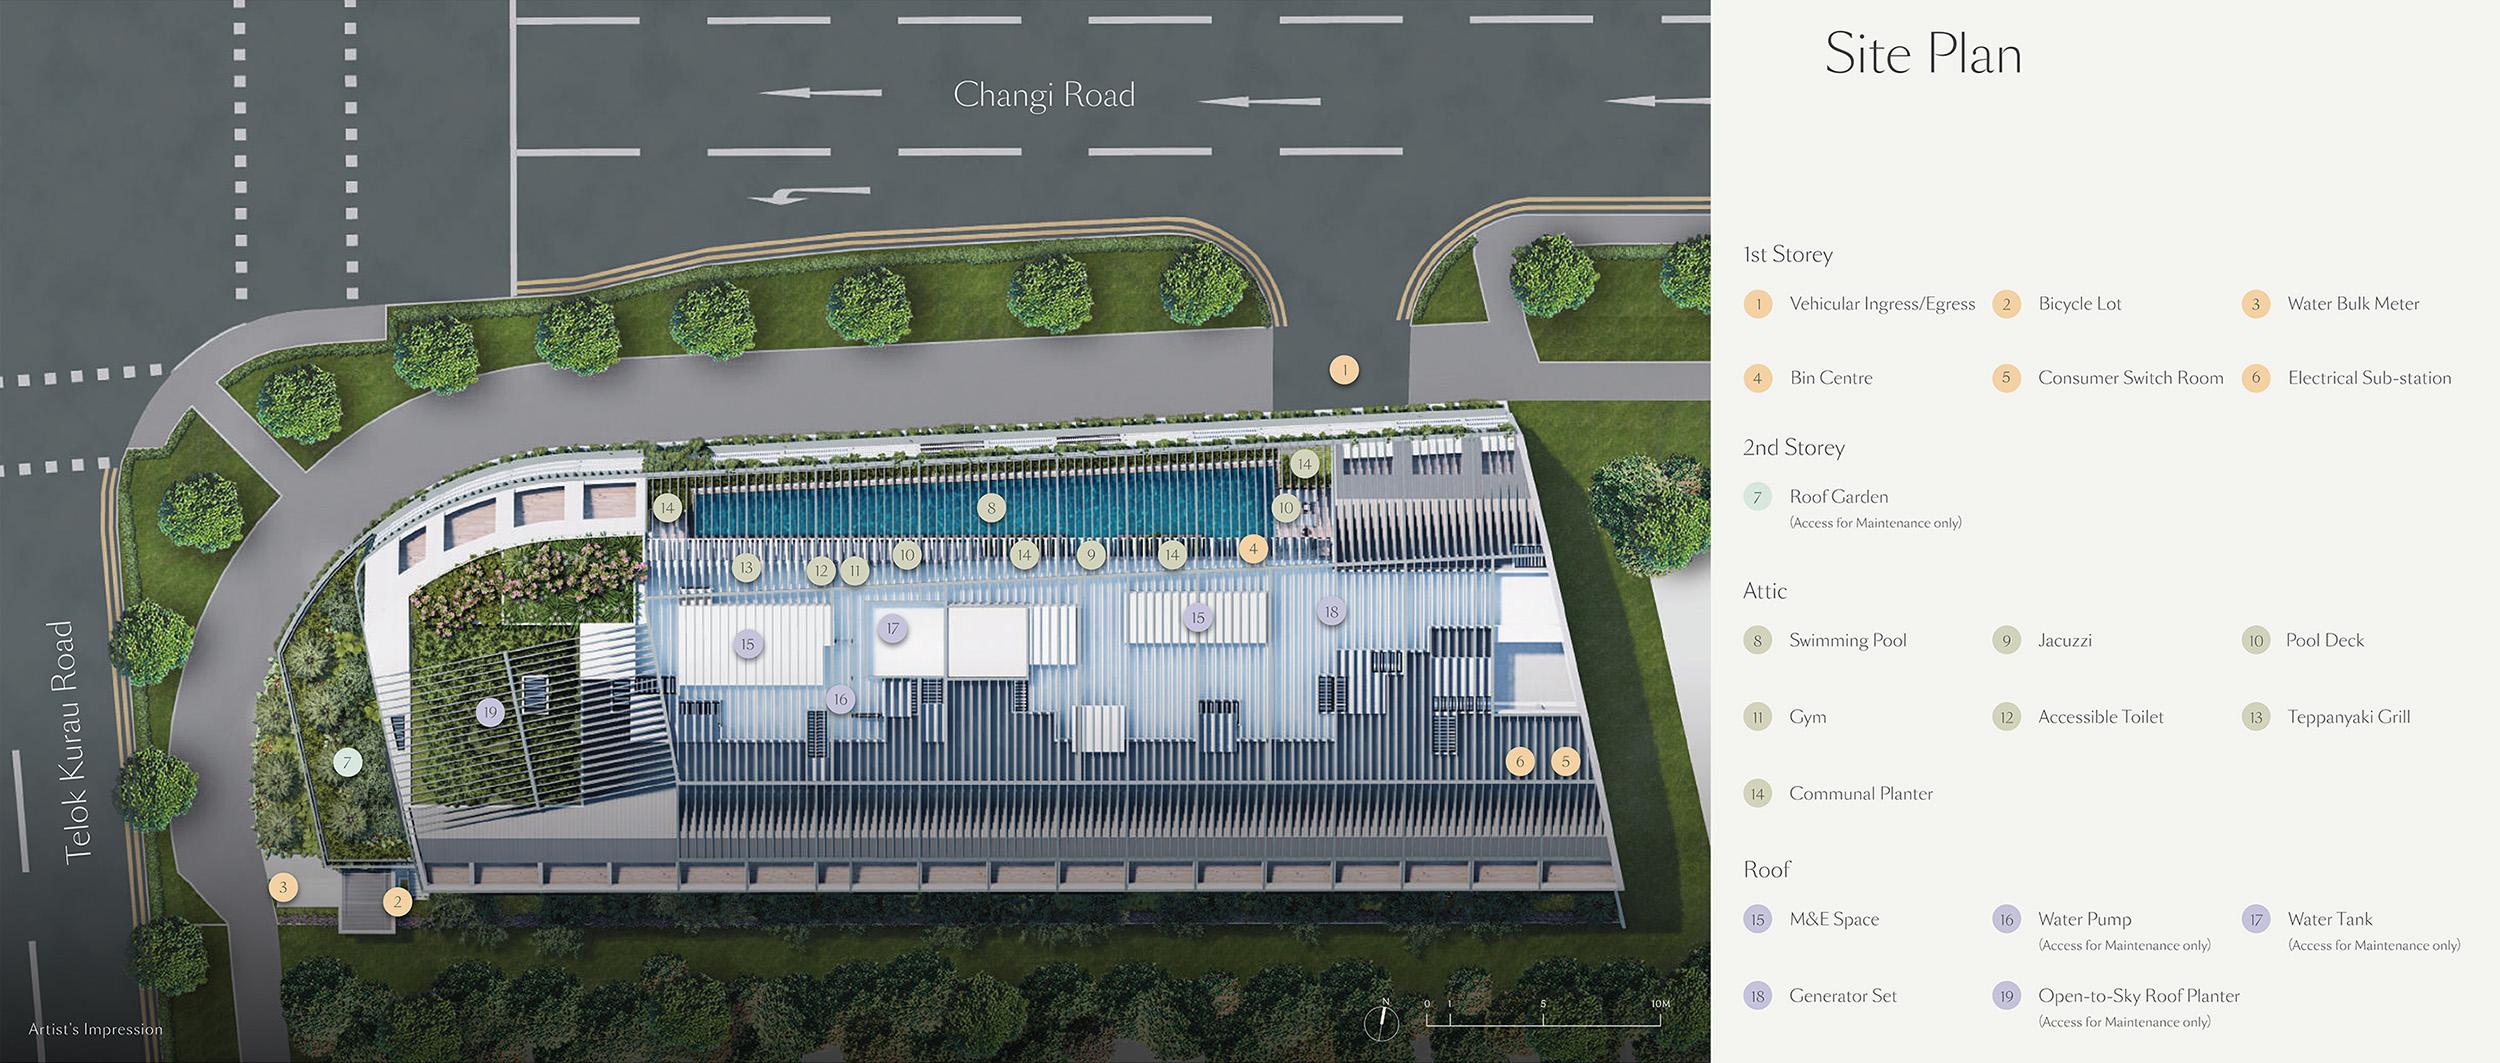 new-condo-singapore-tedge-facilities-site-plan